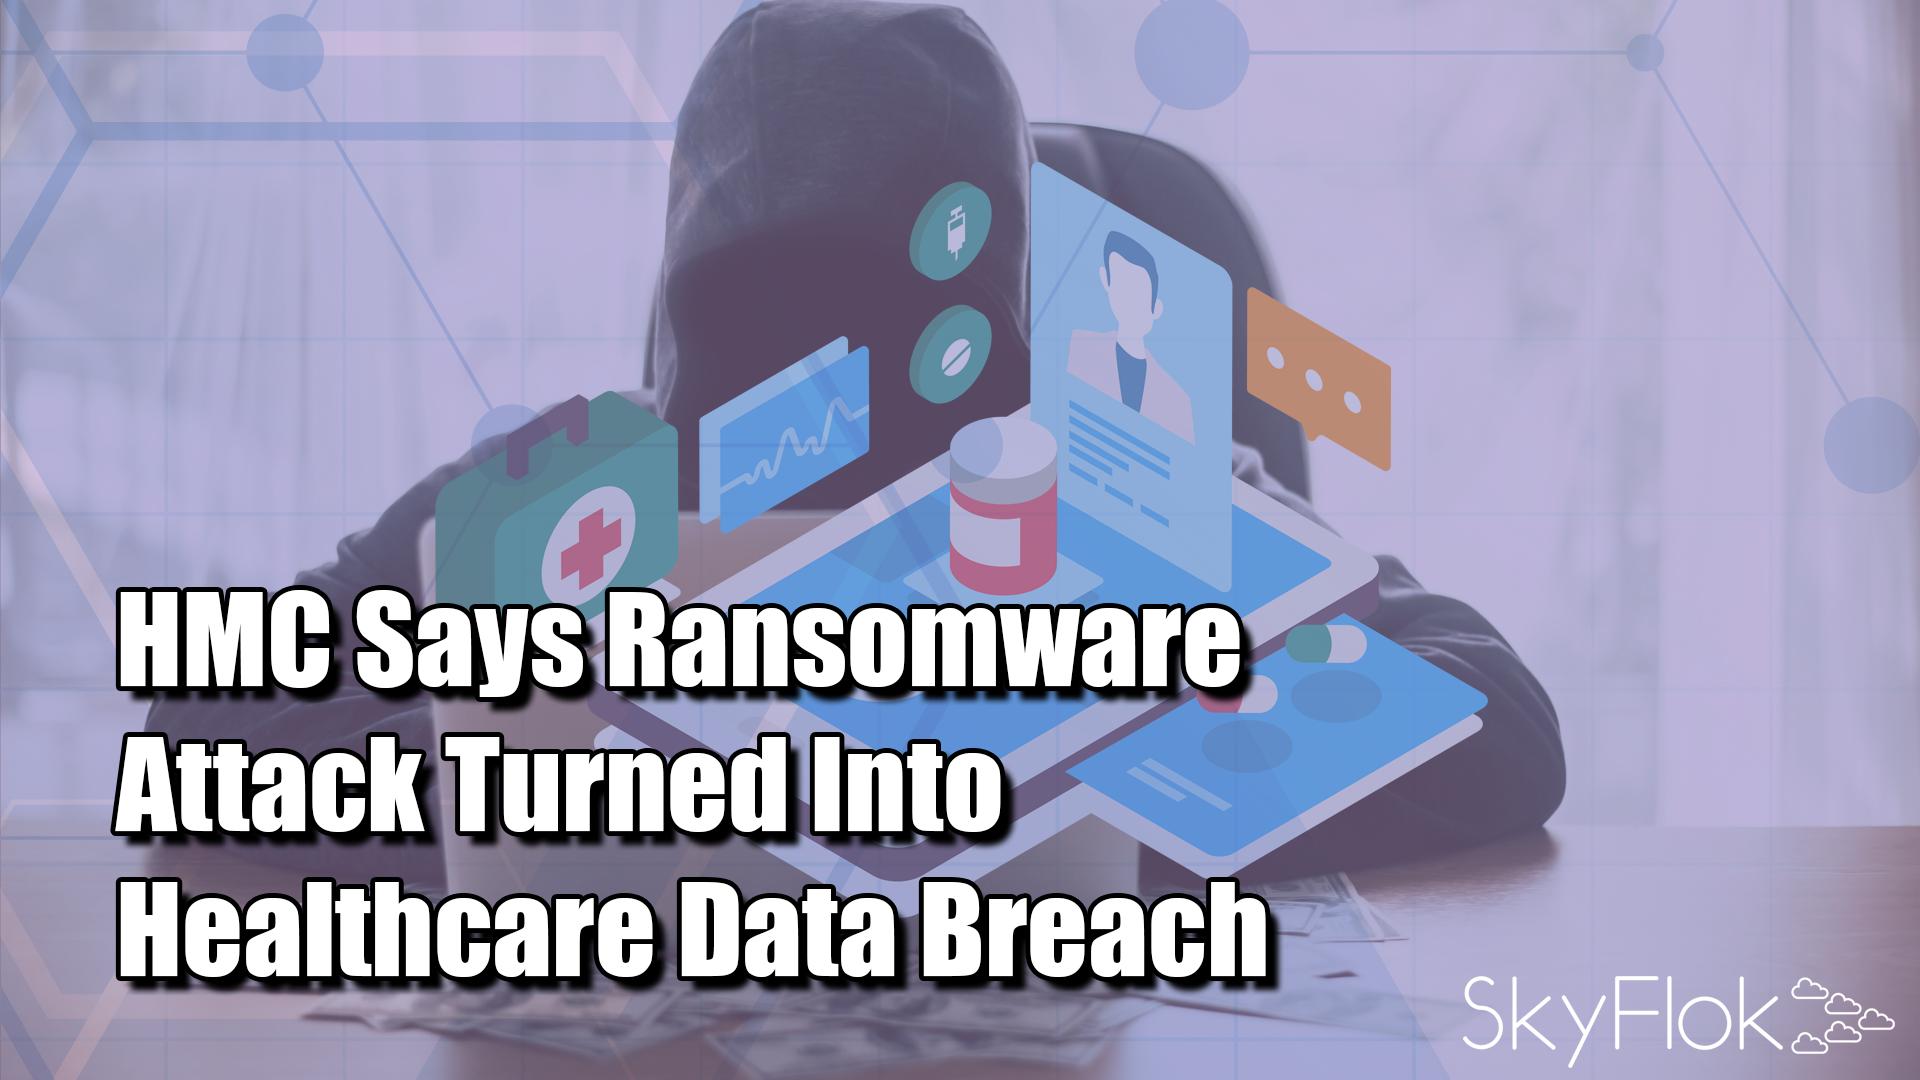 HMC Says Ransomware Attack Turned Into Healthcare Data Breach